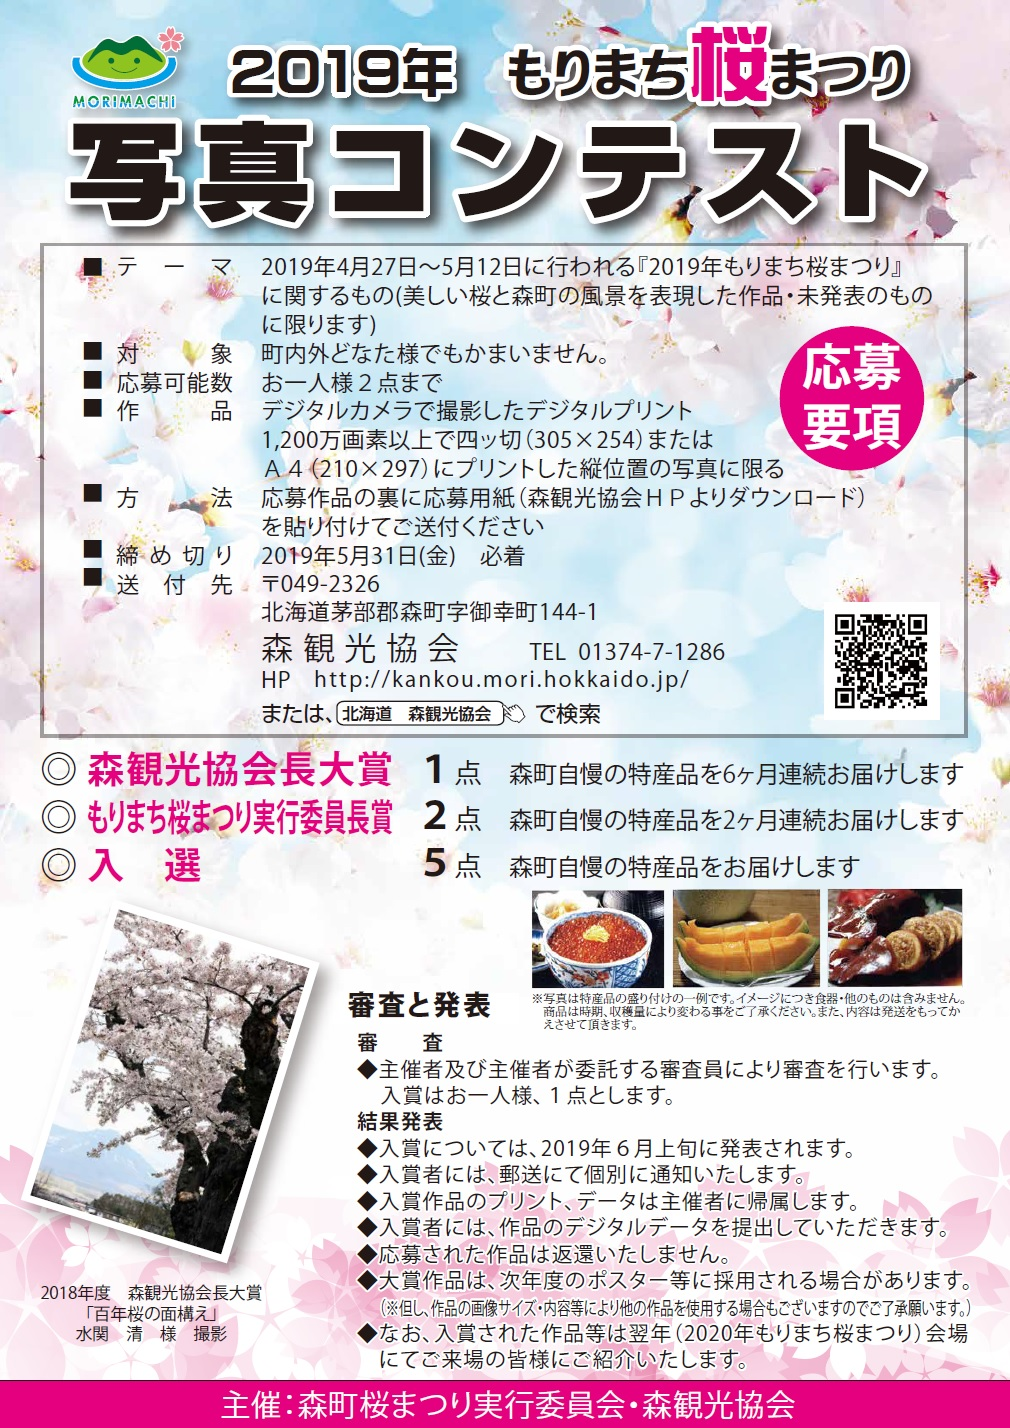 http://kankou.mori.hokkaido.jp/information/images/%E5%86%99%E7%9C%9F%E3%82%B3%E3%83%B3%E3%83%81%E3%83%A9%E3%82%B72019.jpg